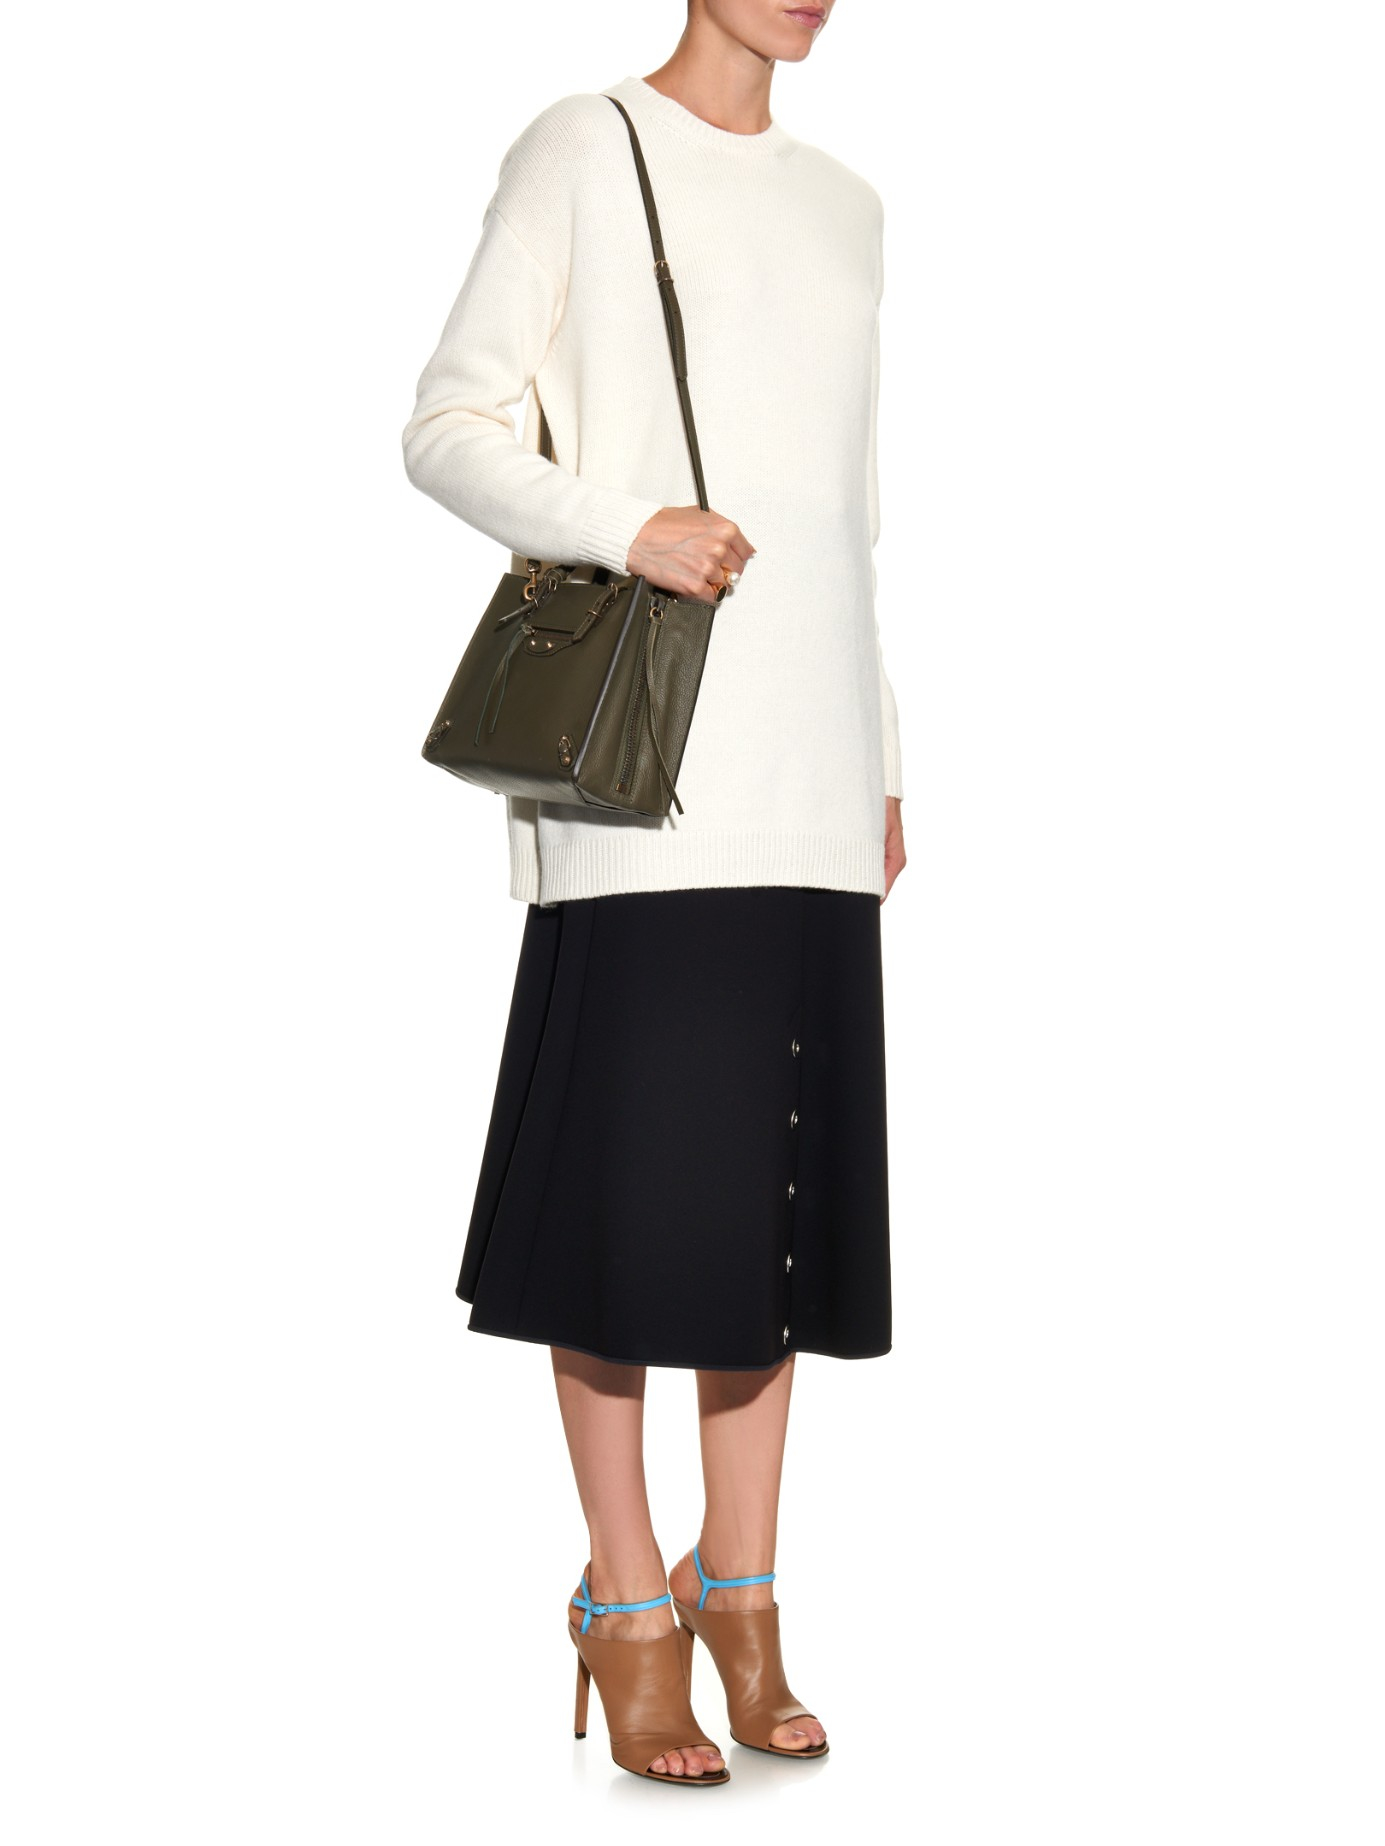 Lyst - Balenciaga Papier A6 Leather Shoulder Bag in Natural 886b05ac02c3d